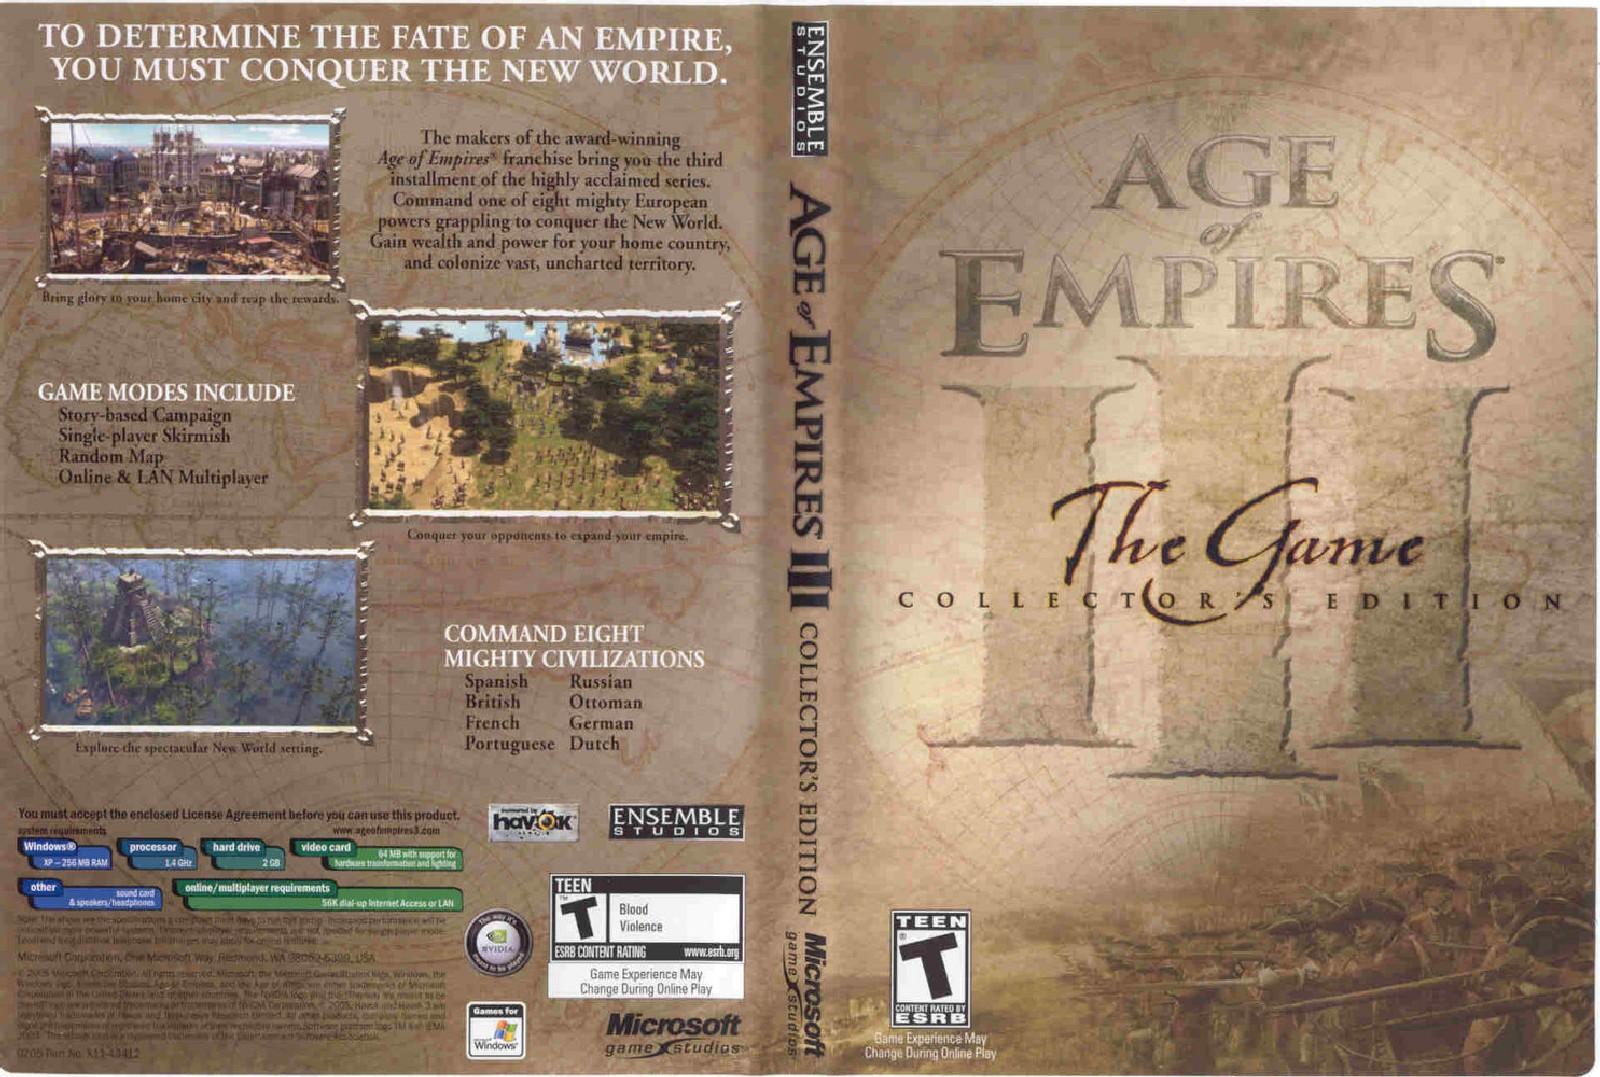 http://2.bp.blogspot.com/-eC3YCUoe_Rk/TjV9fBvDABI/AAAAAAAABm4/k52uEbw9FzQ/s1600/Age_Of_Empires_III_CE.jpg